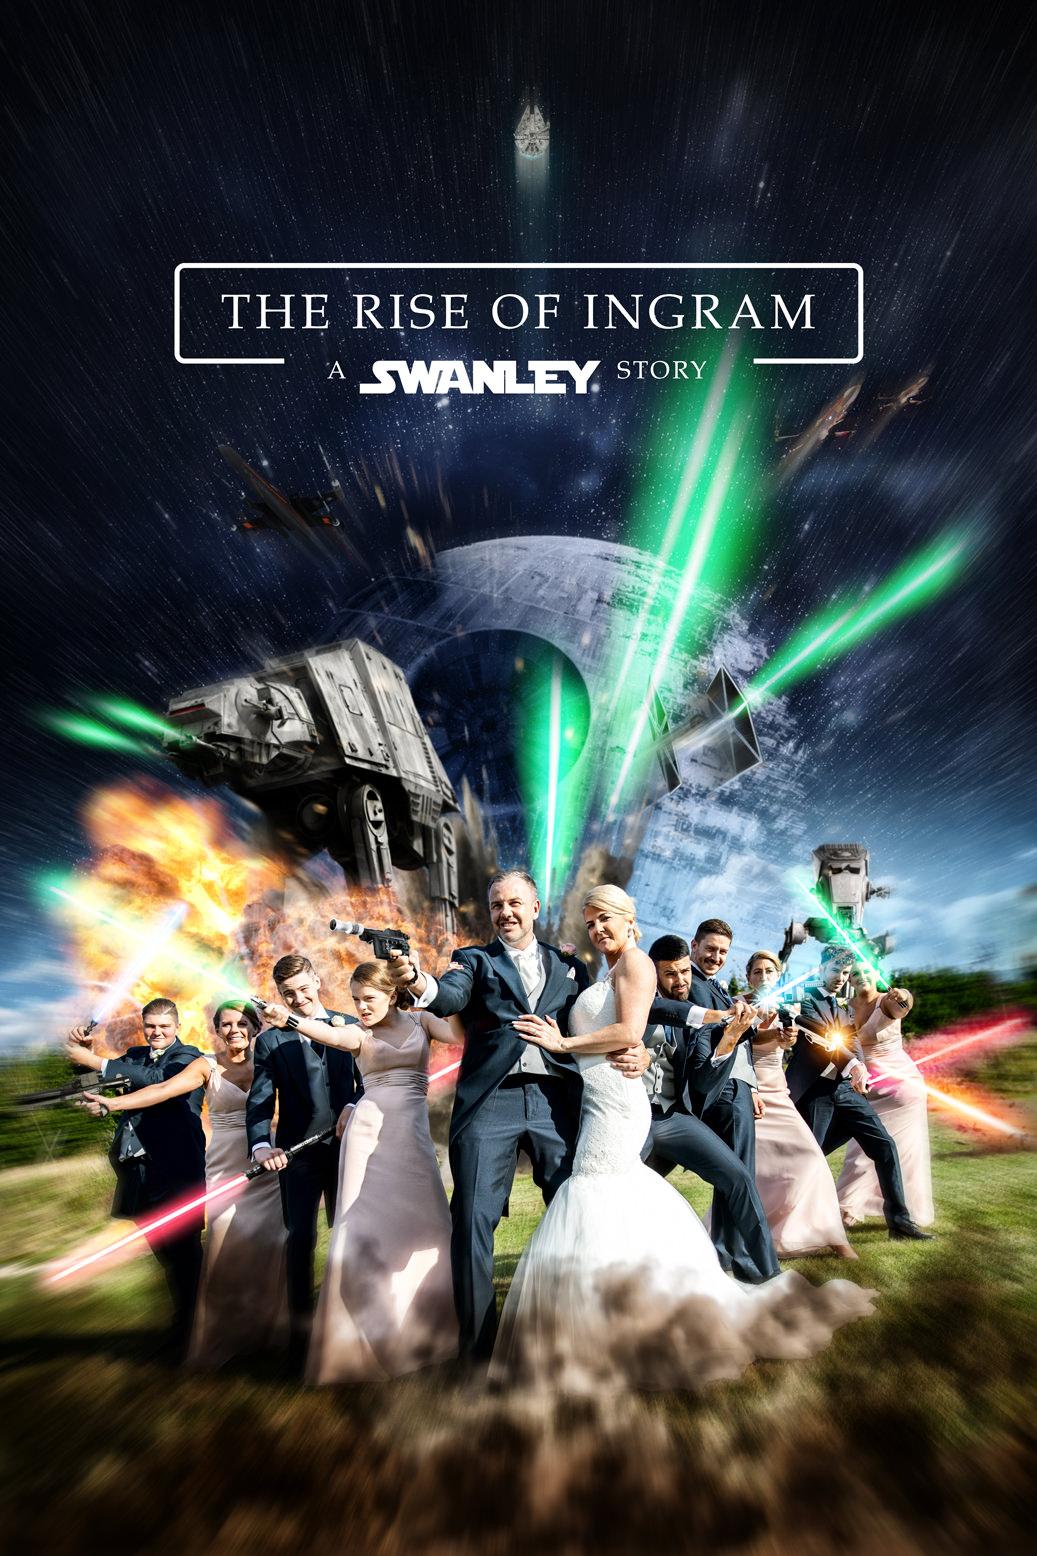 Star Wars wedding photo